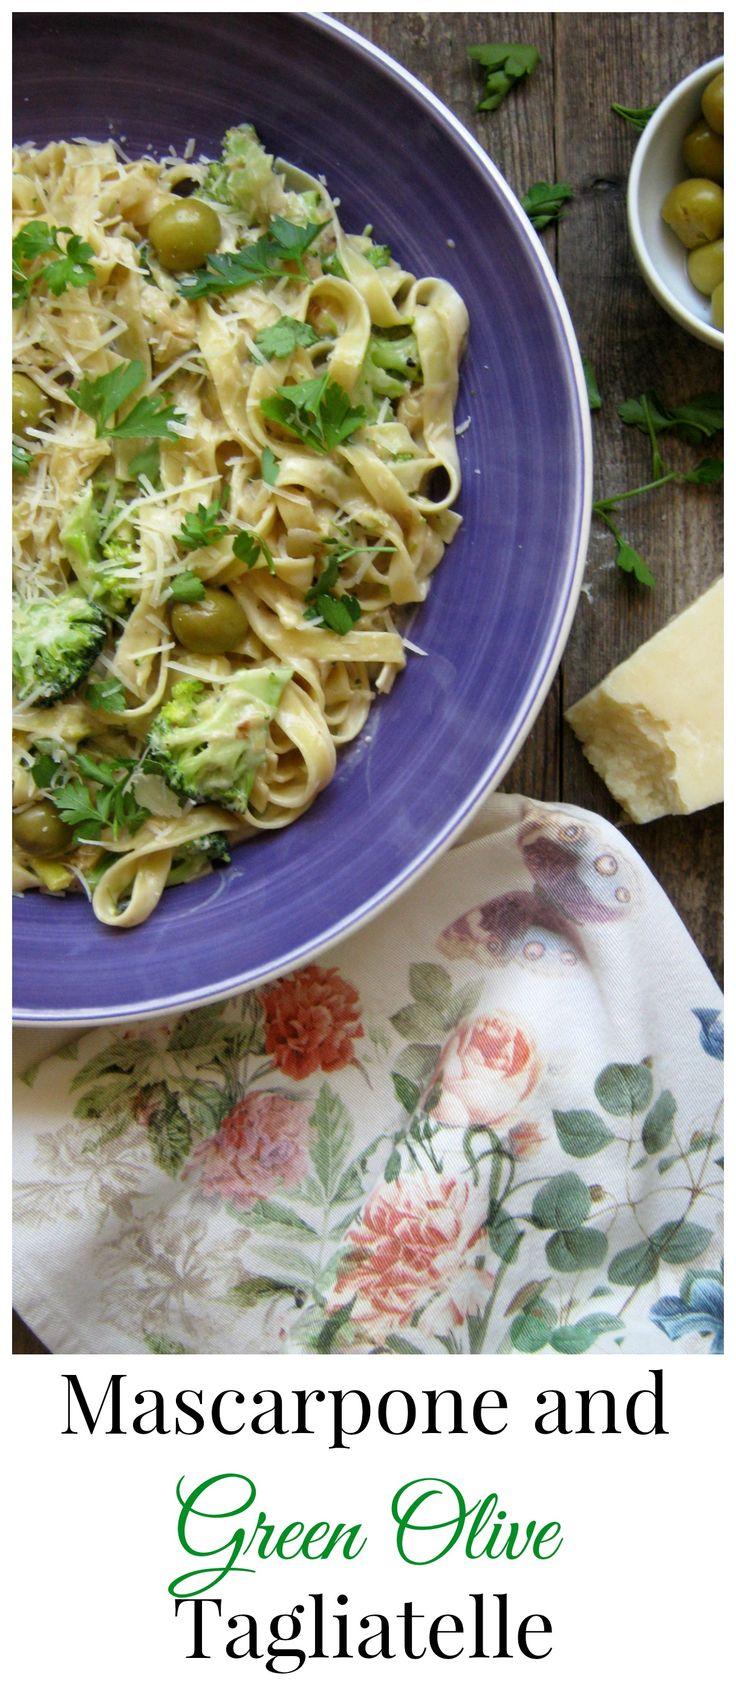 Mascarpone & Green Olive Tagliatelle http://www.juliascuisine.com/home/mascarpone-and-green-olive-tagliatelle